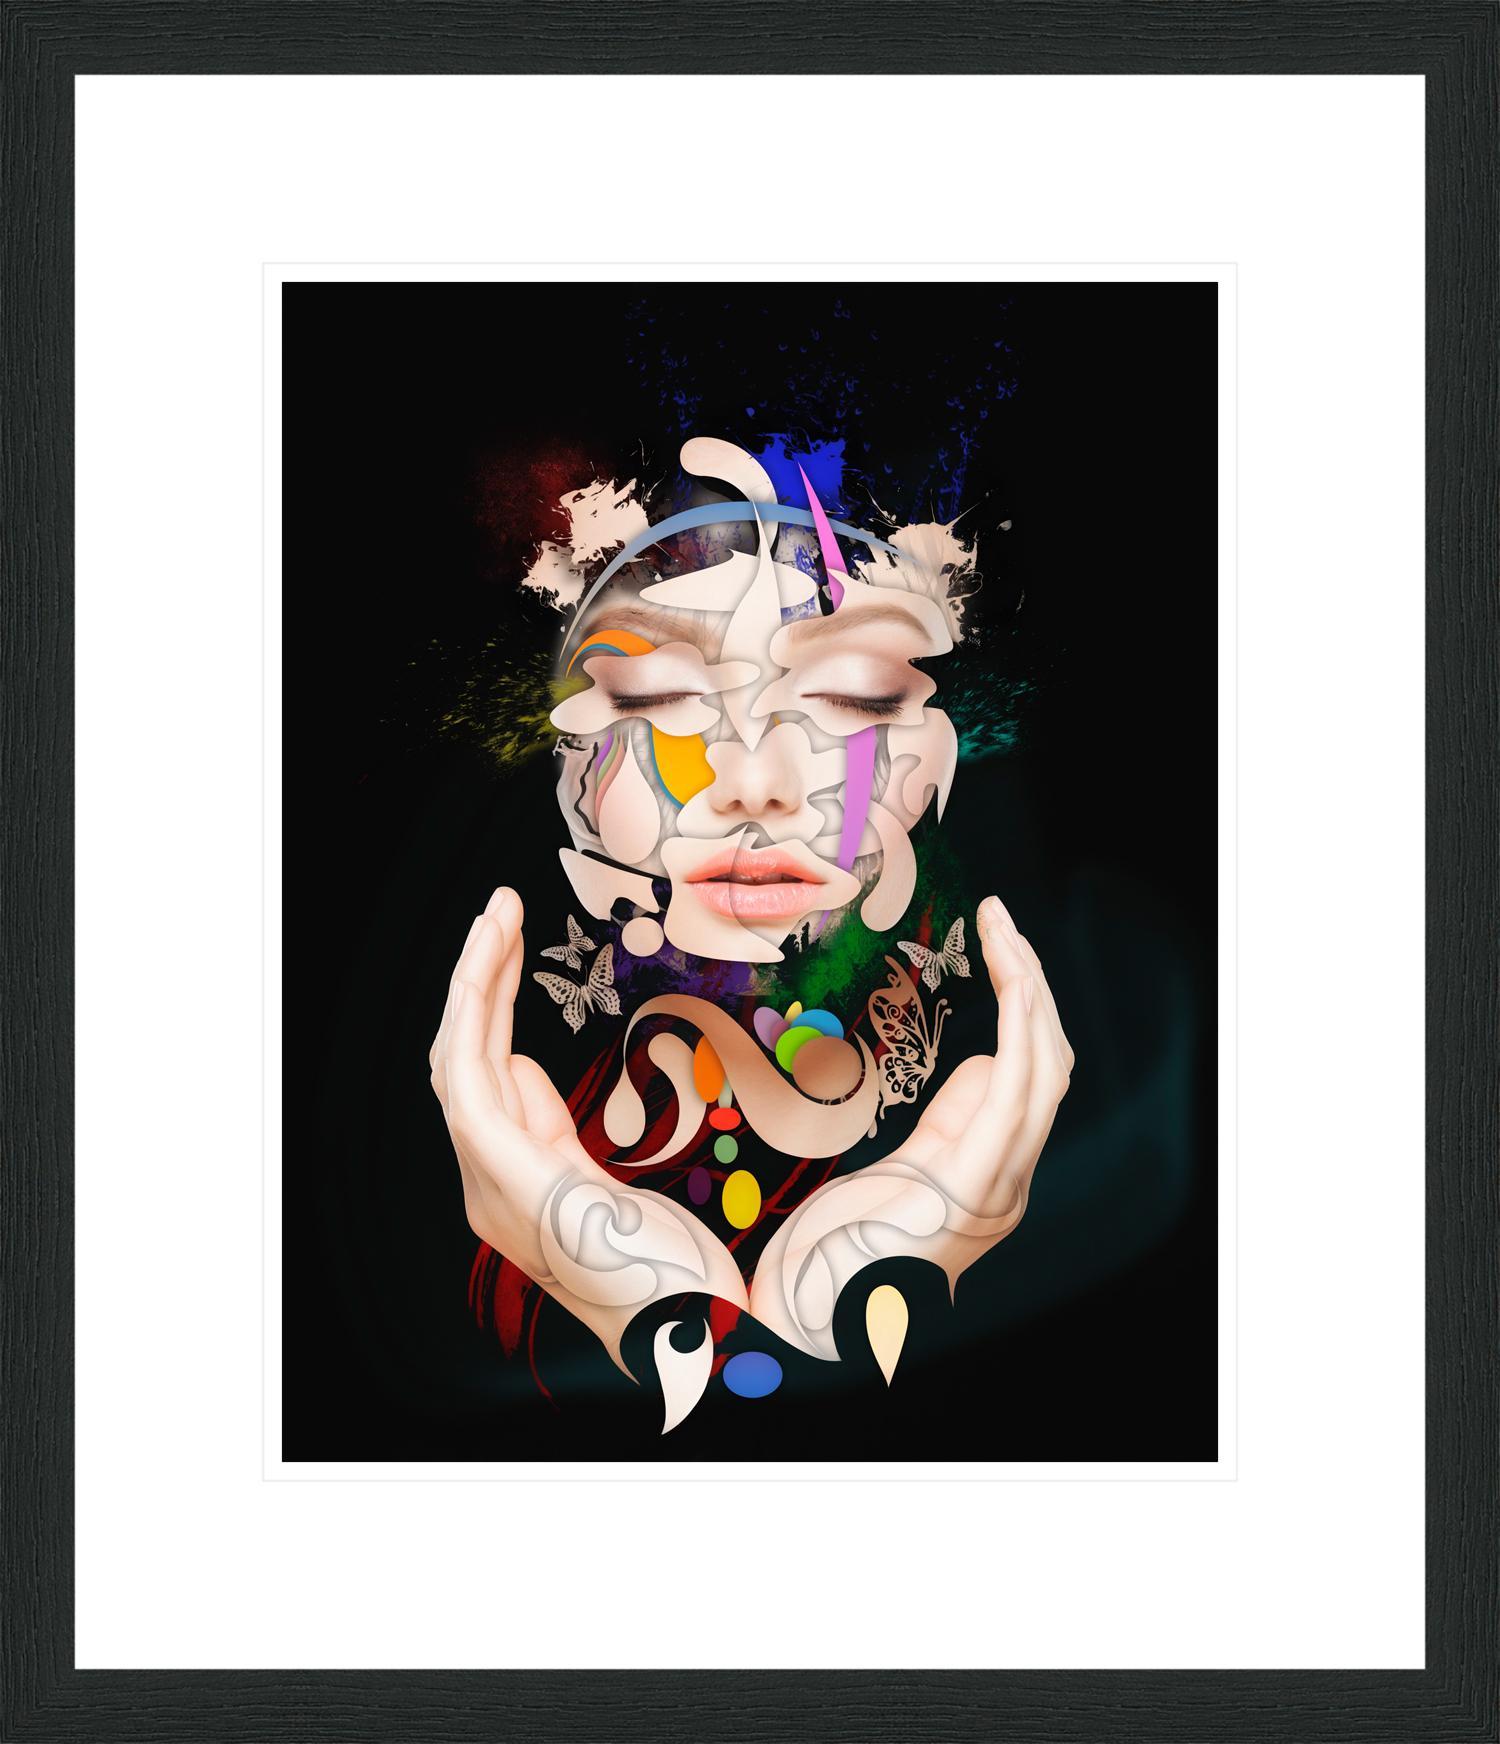 Abstract Portrait No 16 - Erik Brede